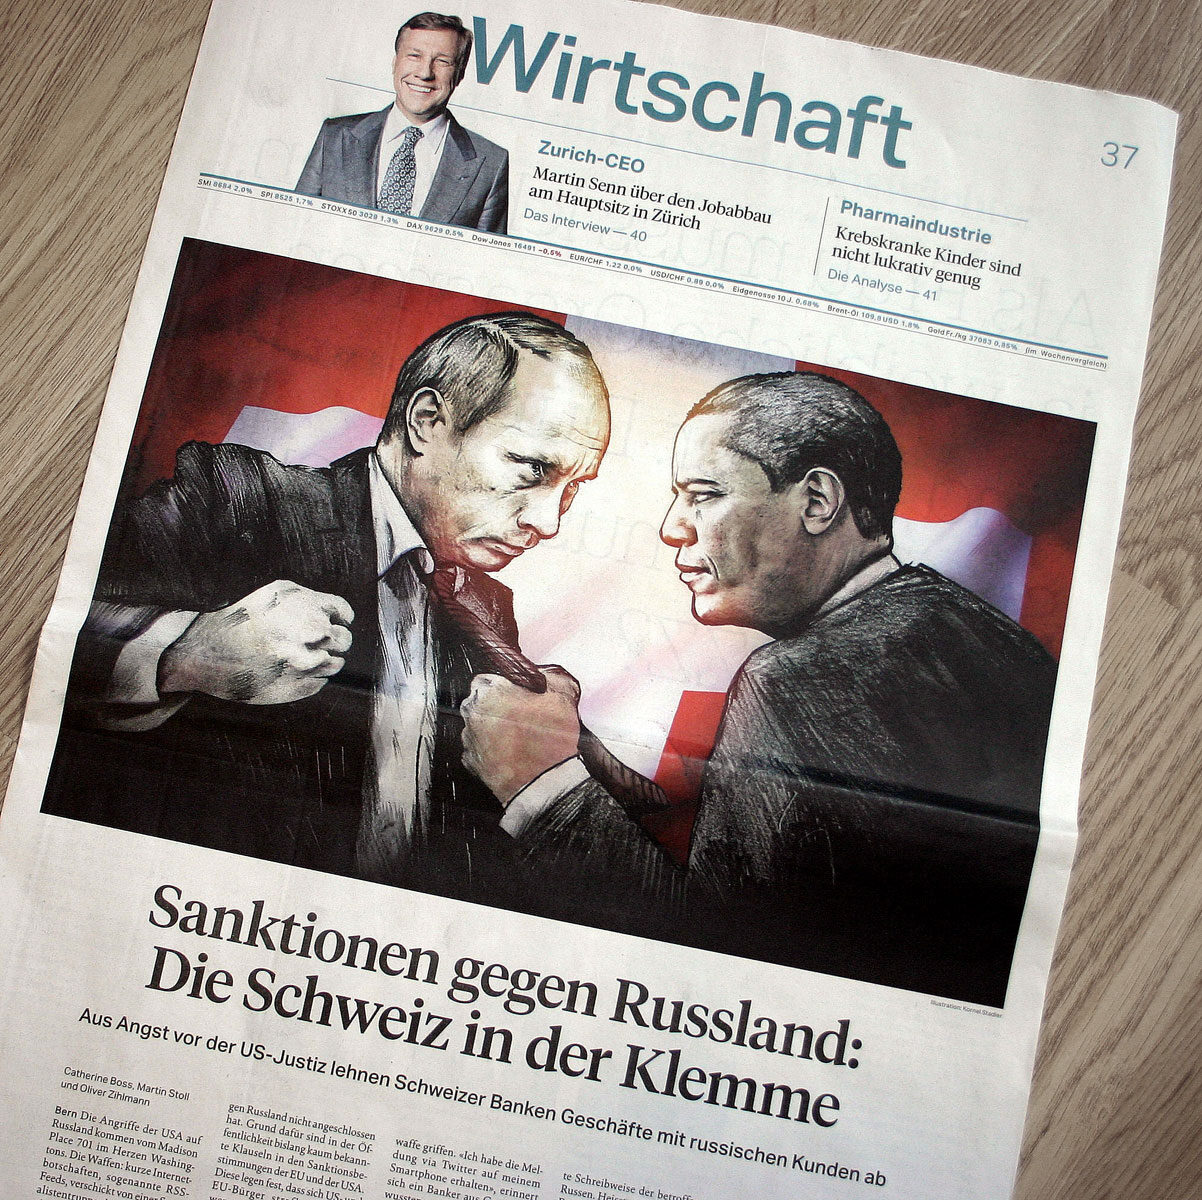 Foto Zeitung1 - Kornel Illustration | Kornel Stadler portfolio